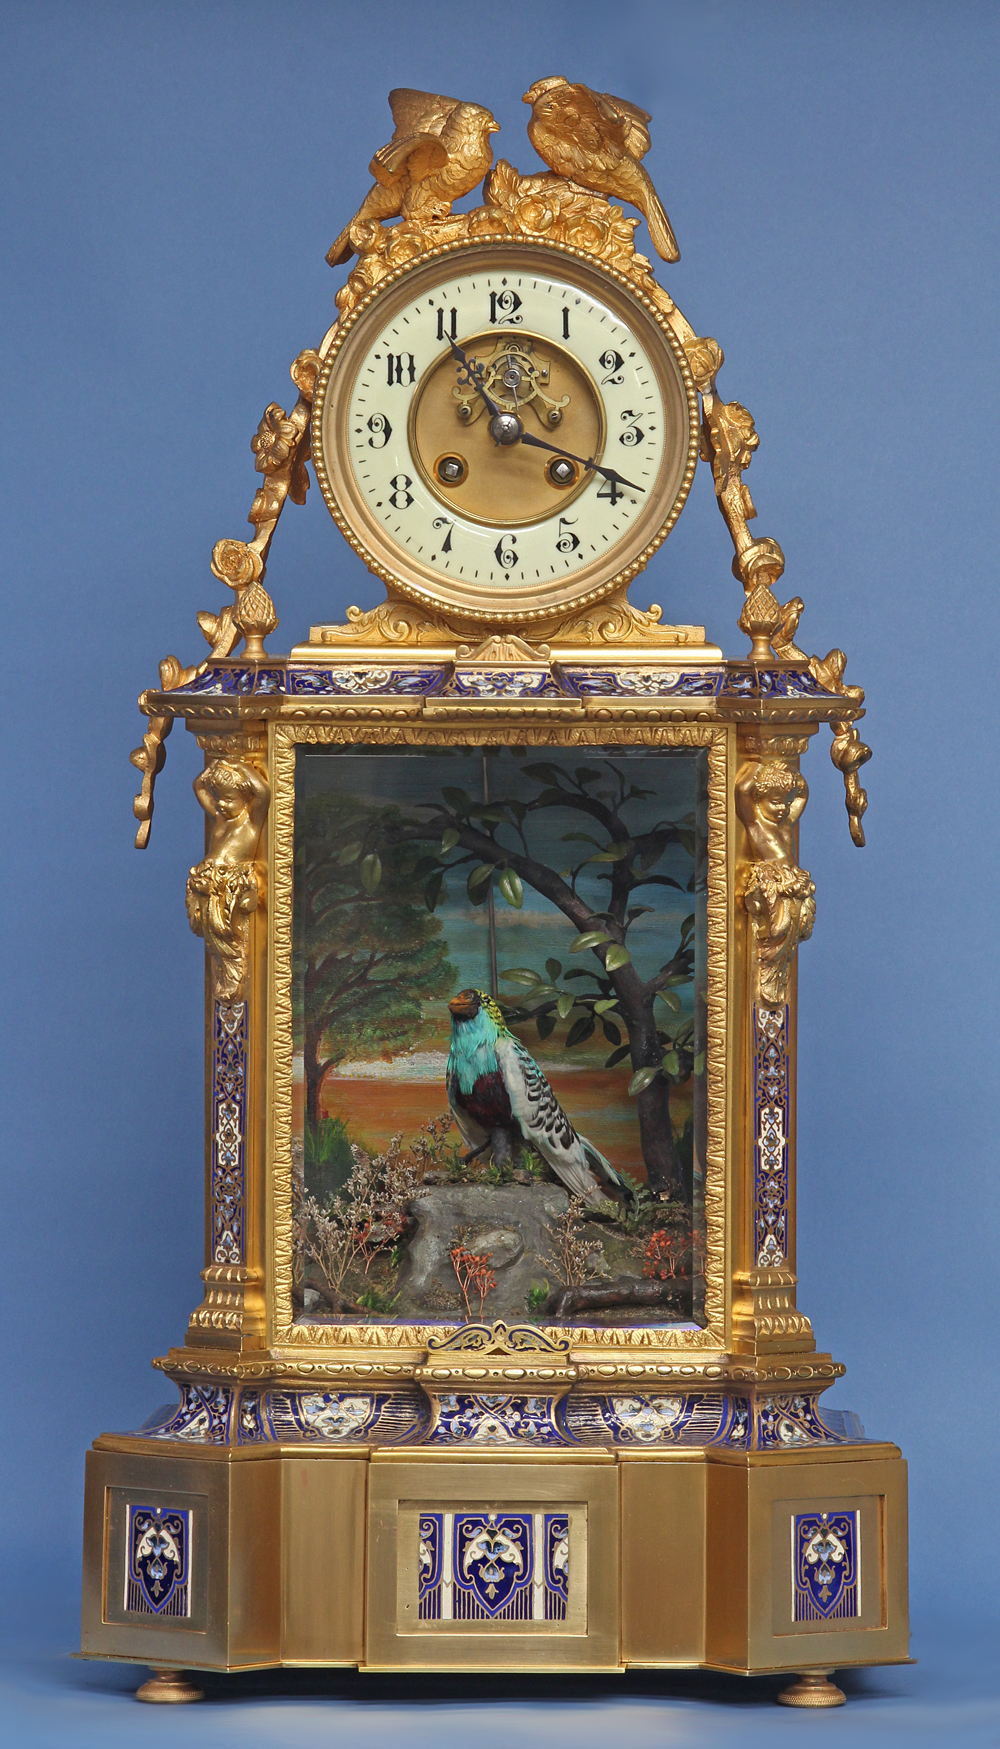 c1895 French Animated Singing Bird Clock